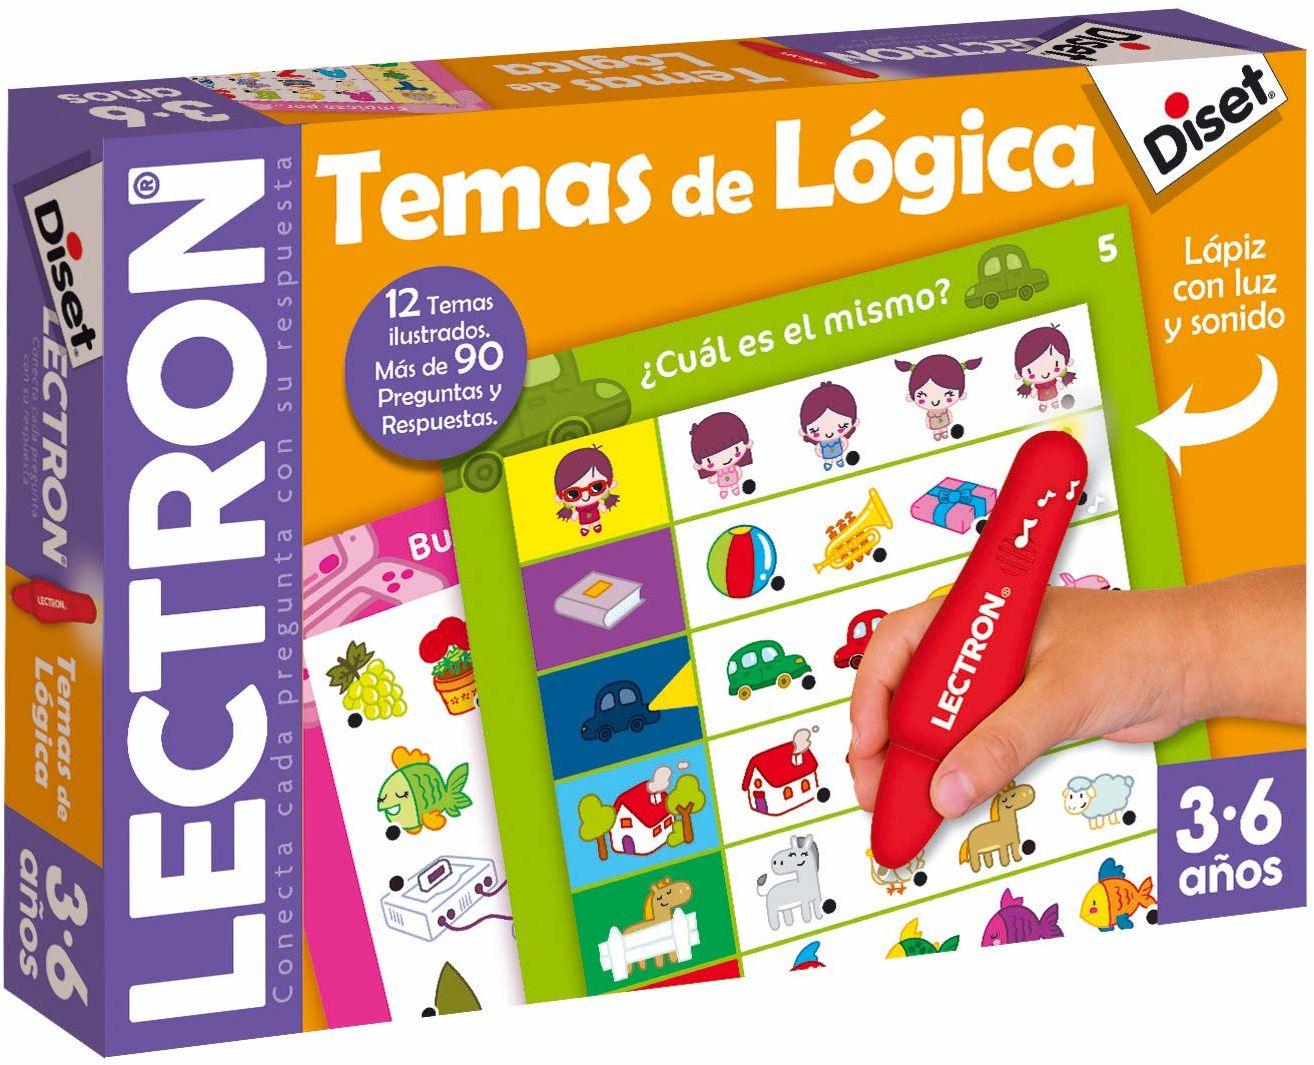 Diset 63882 Lectron Lapiz Temas de Lógica hiszpański język gra edukacyjna